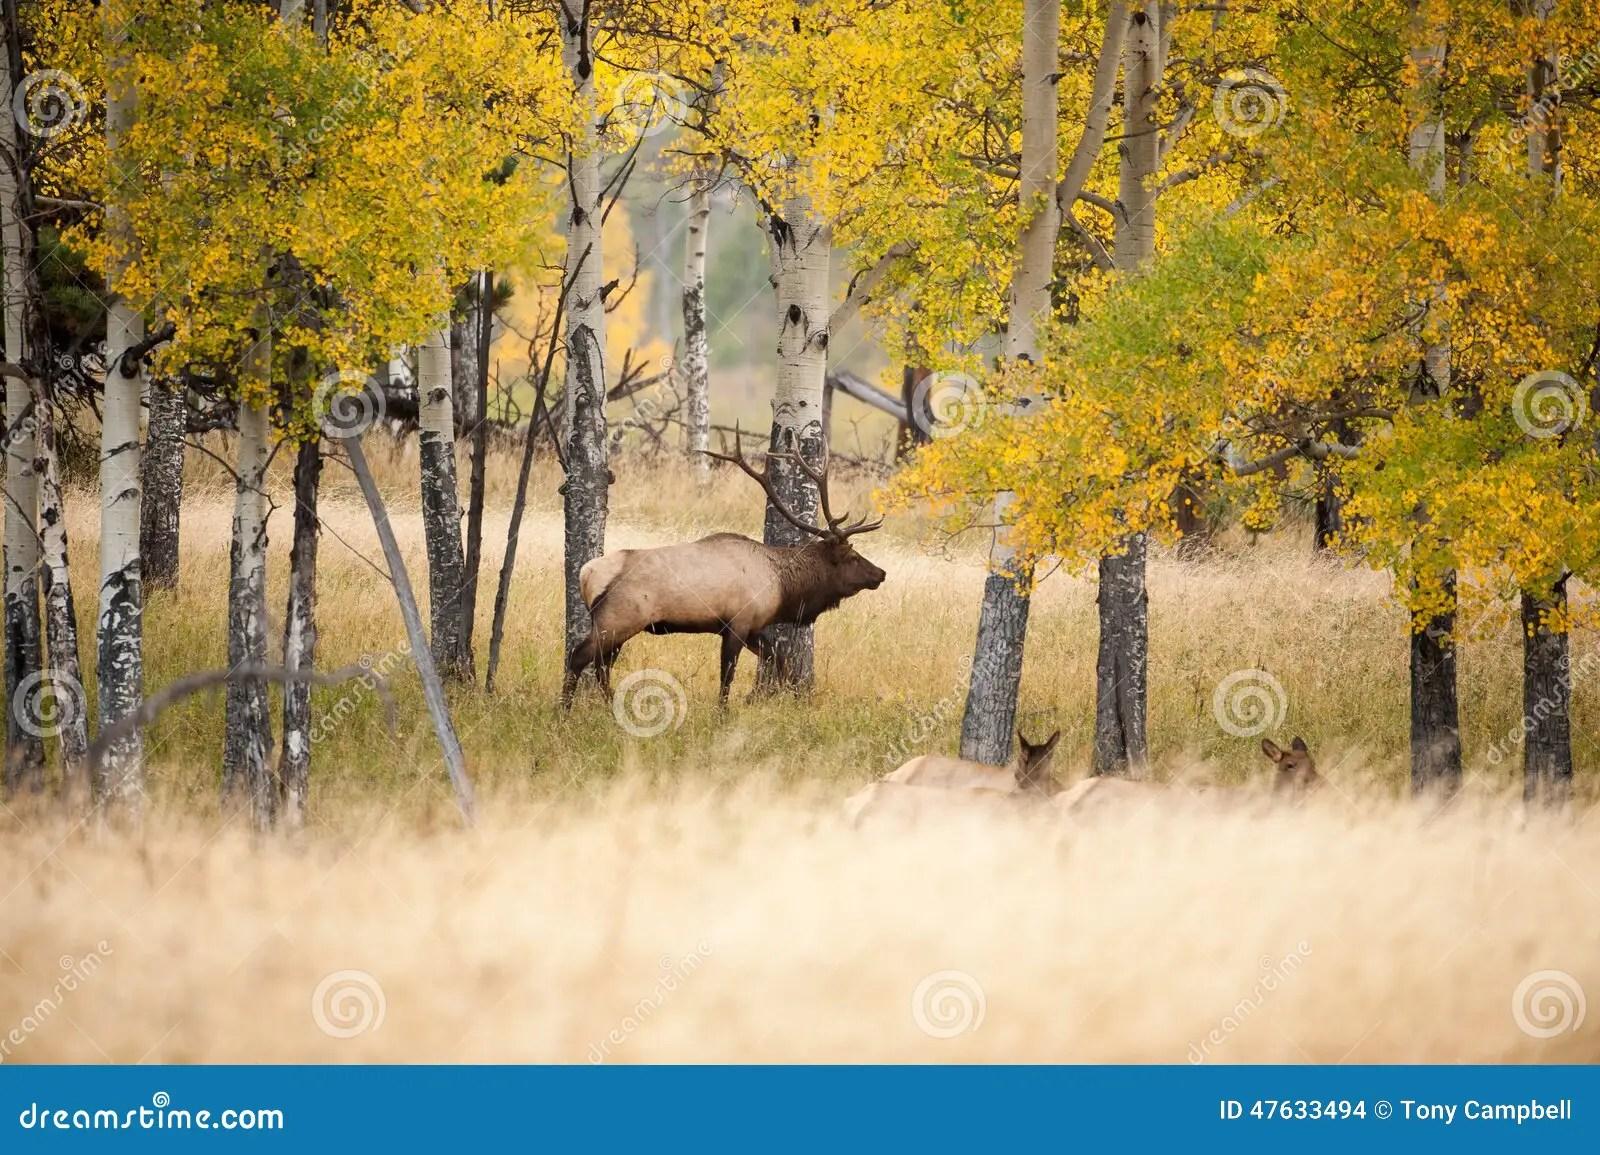 Fall Hunting Wallpaper North American Elk Stock Photo Image Of Mammal Woods